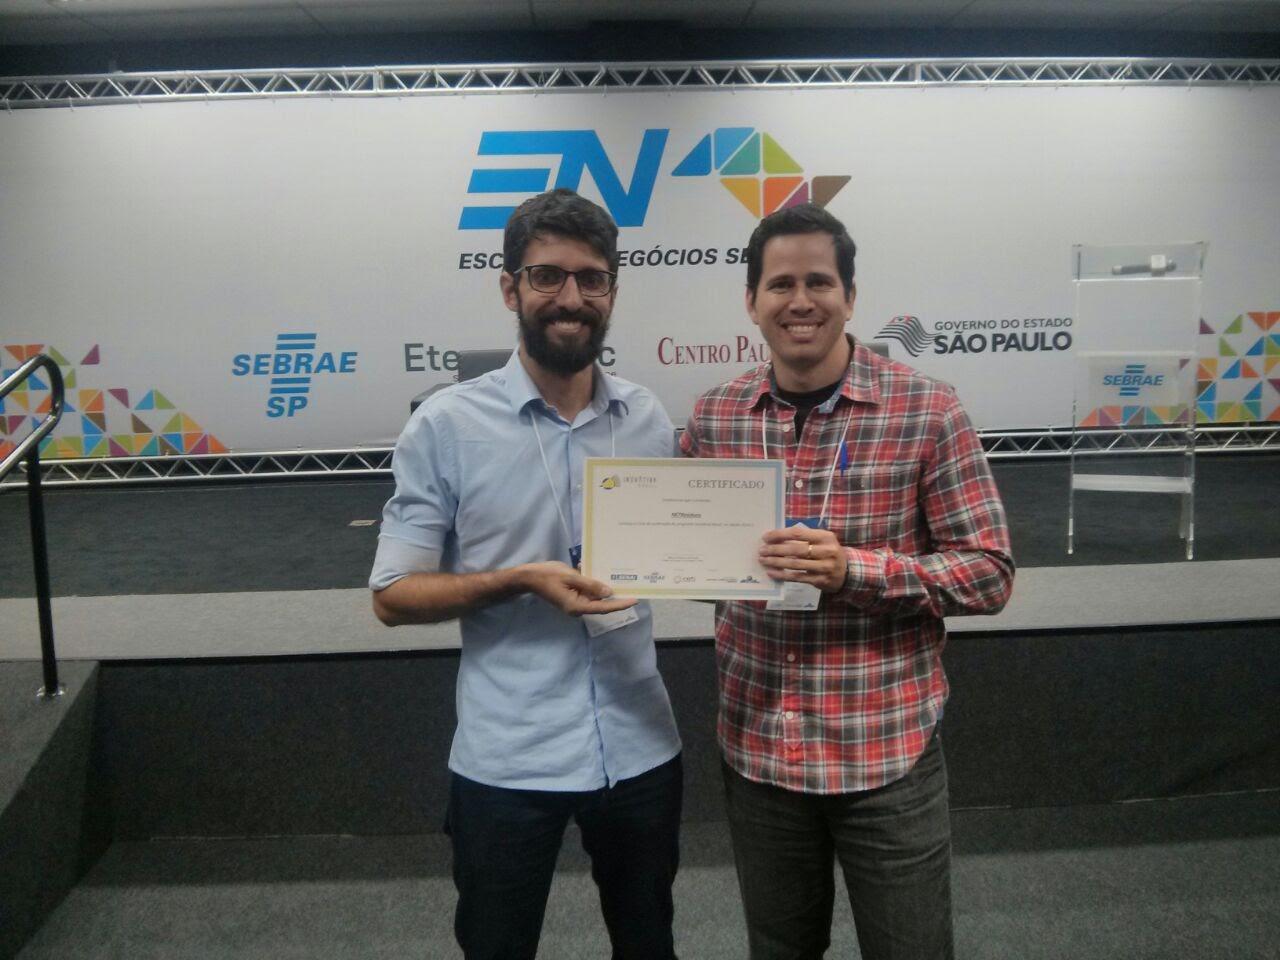 NETResíduos conquista InovAtiva Brasil